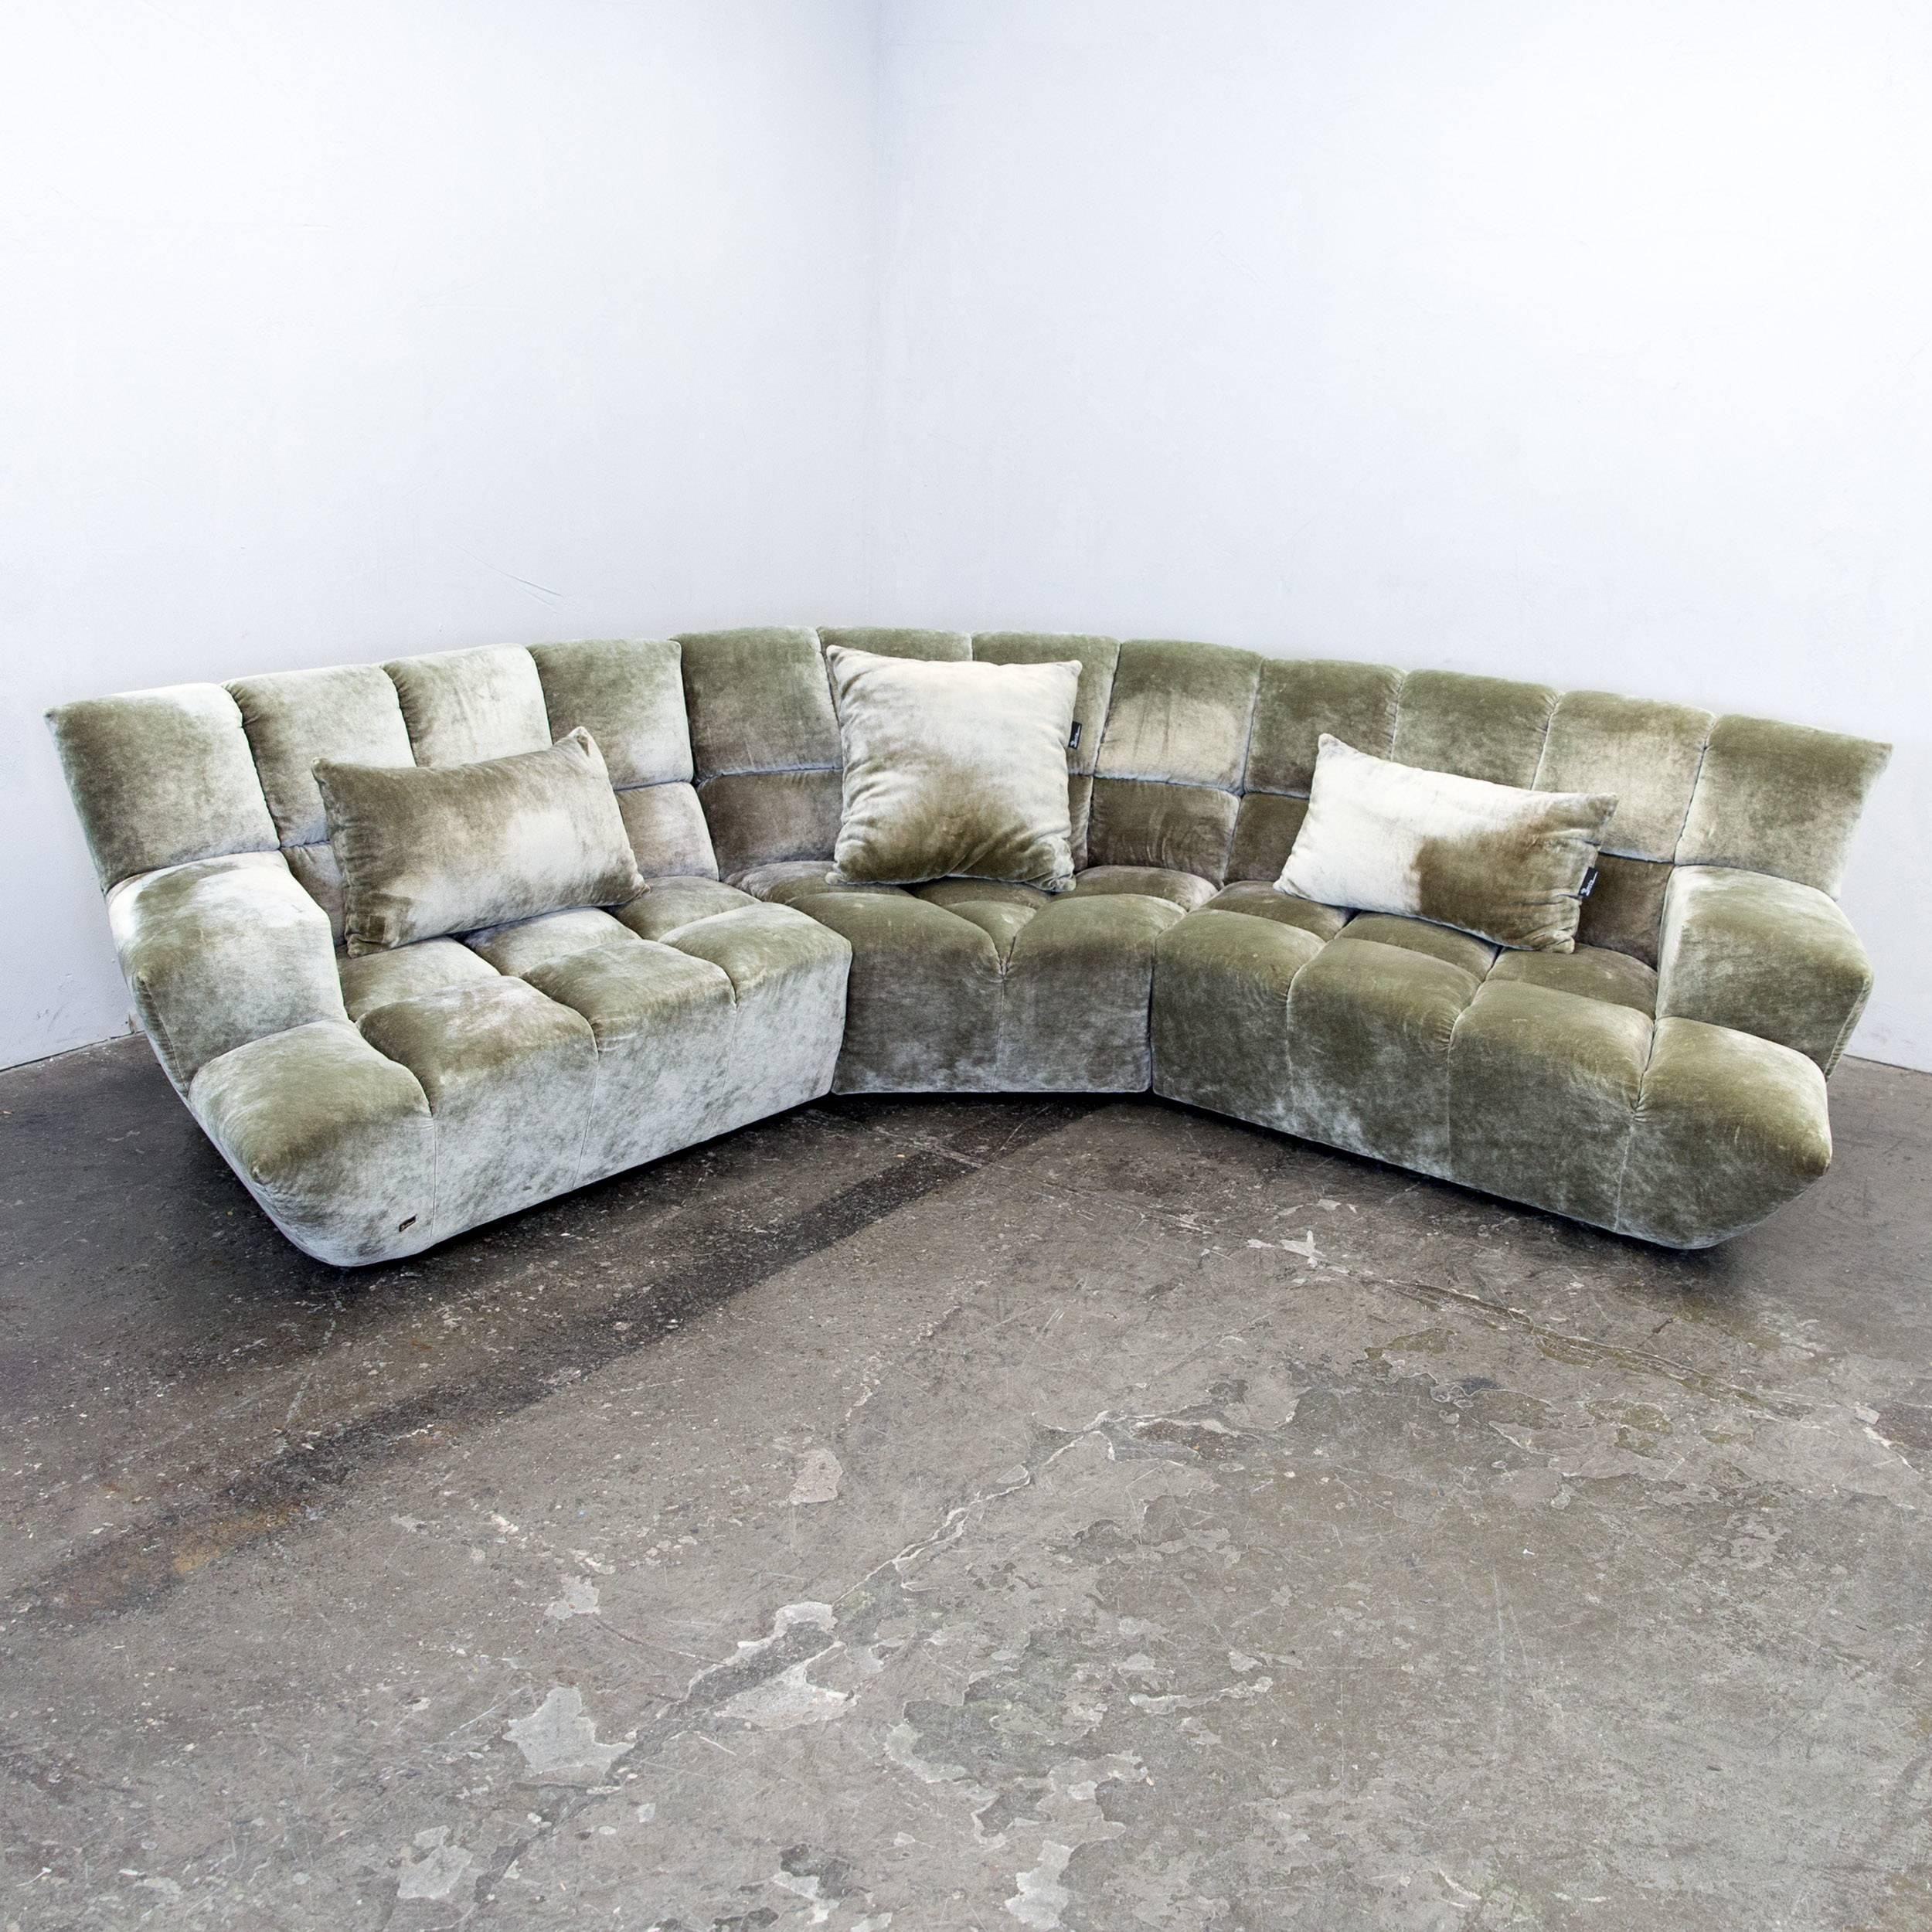 Fesselnd Bretz Cloud 7 Designer Cornersofa Silver Green Fabric Couch Modern At  1stdibs